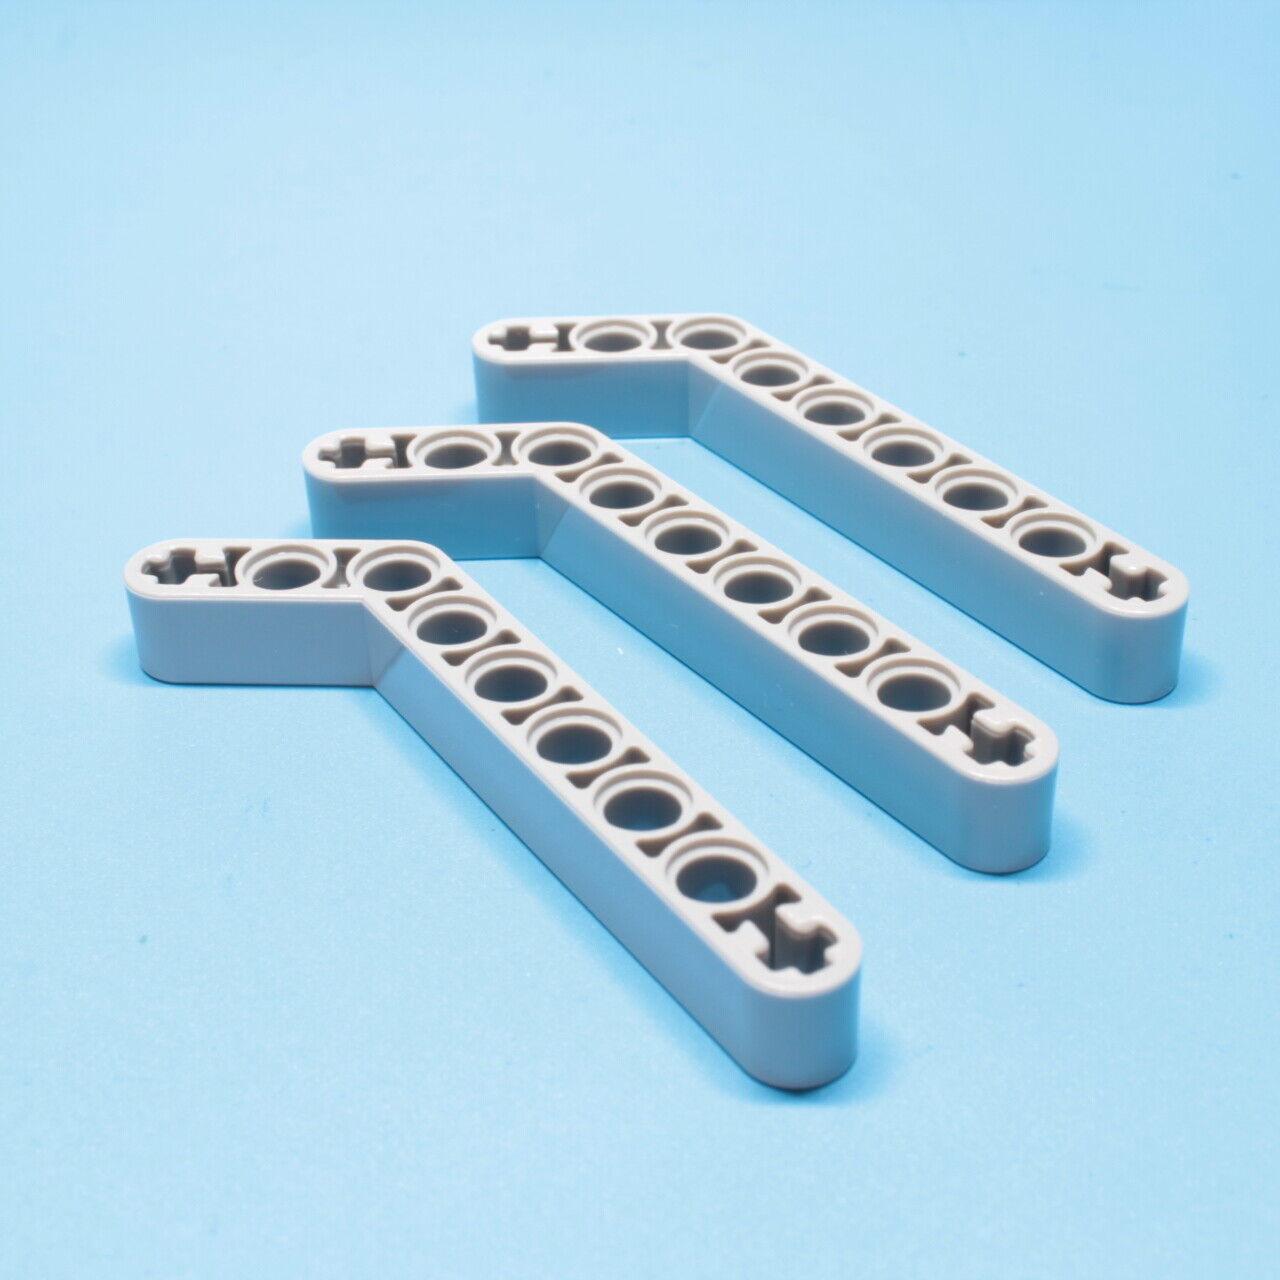 5x Lego® Technic Liftarm 32271 1 x 9 gebogen 7-3 hellgrau Technik 4211624